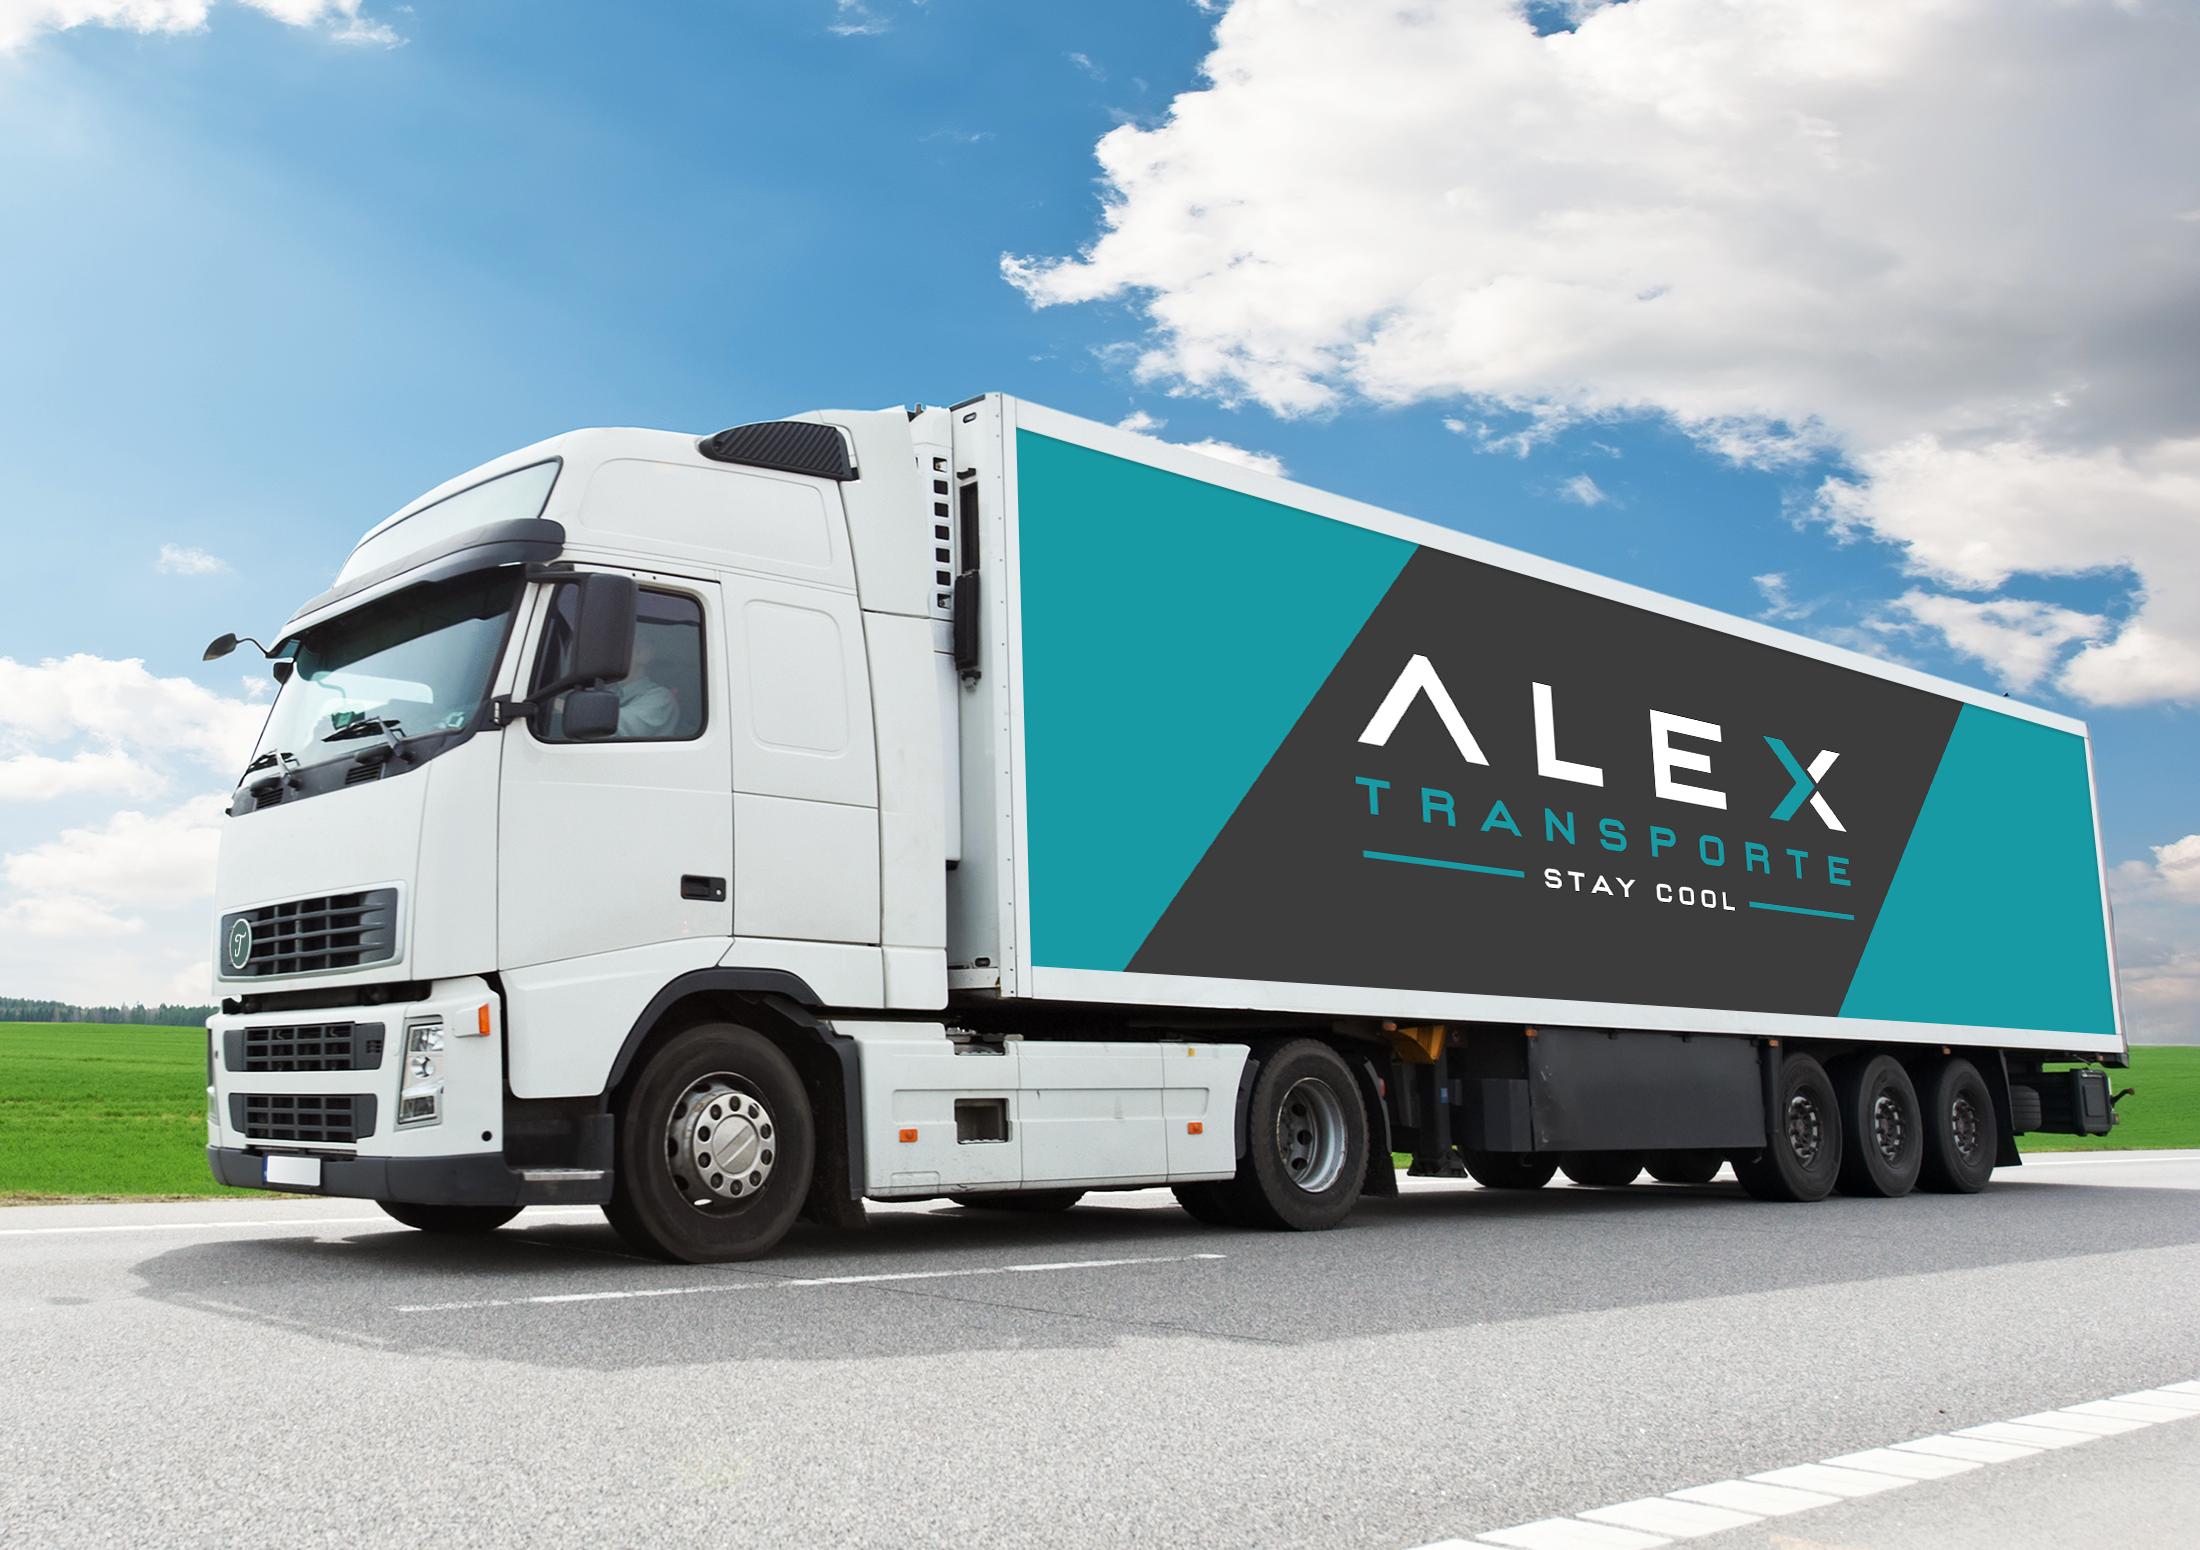 Alex Transporte GmbH